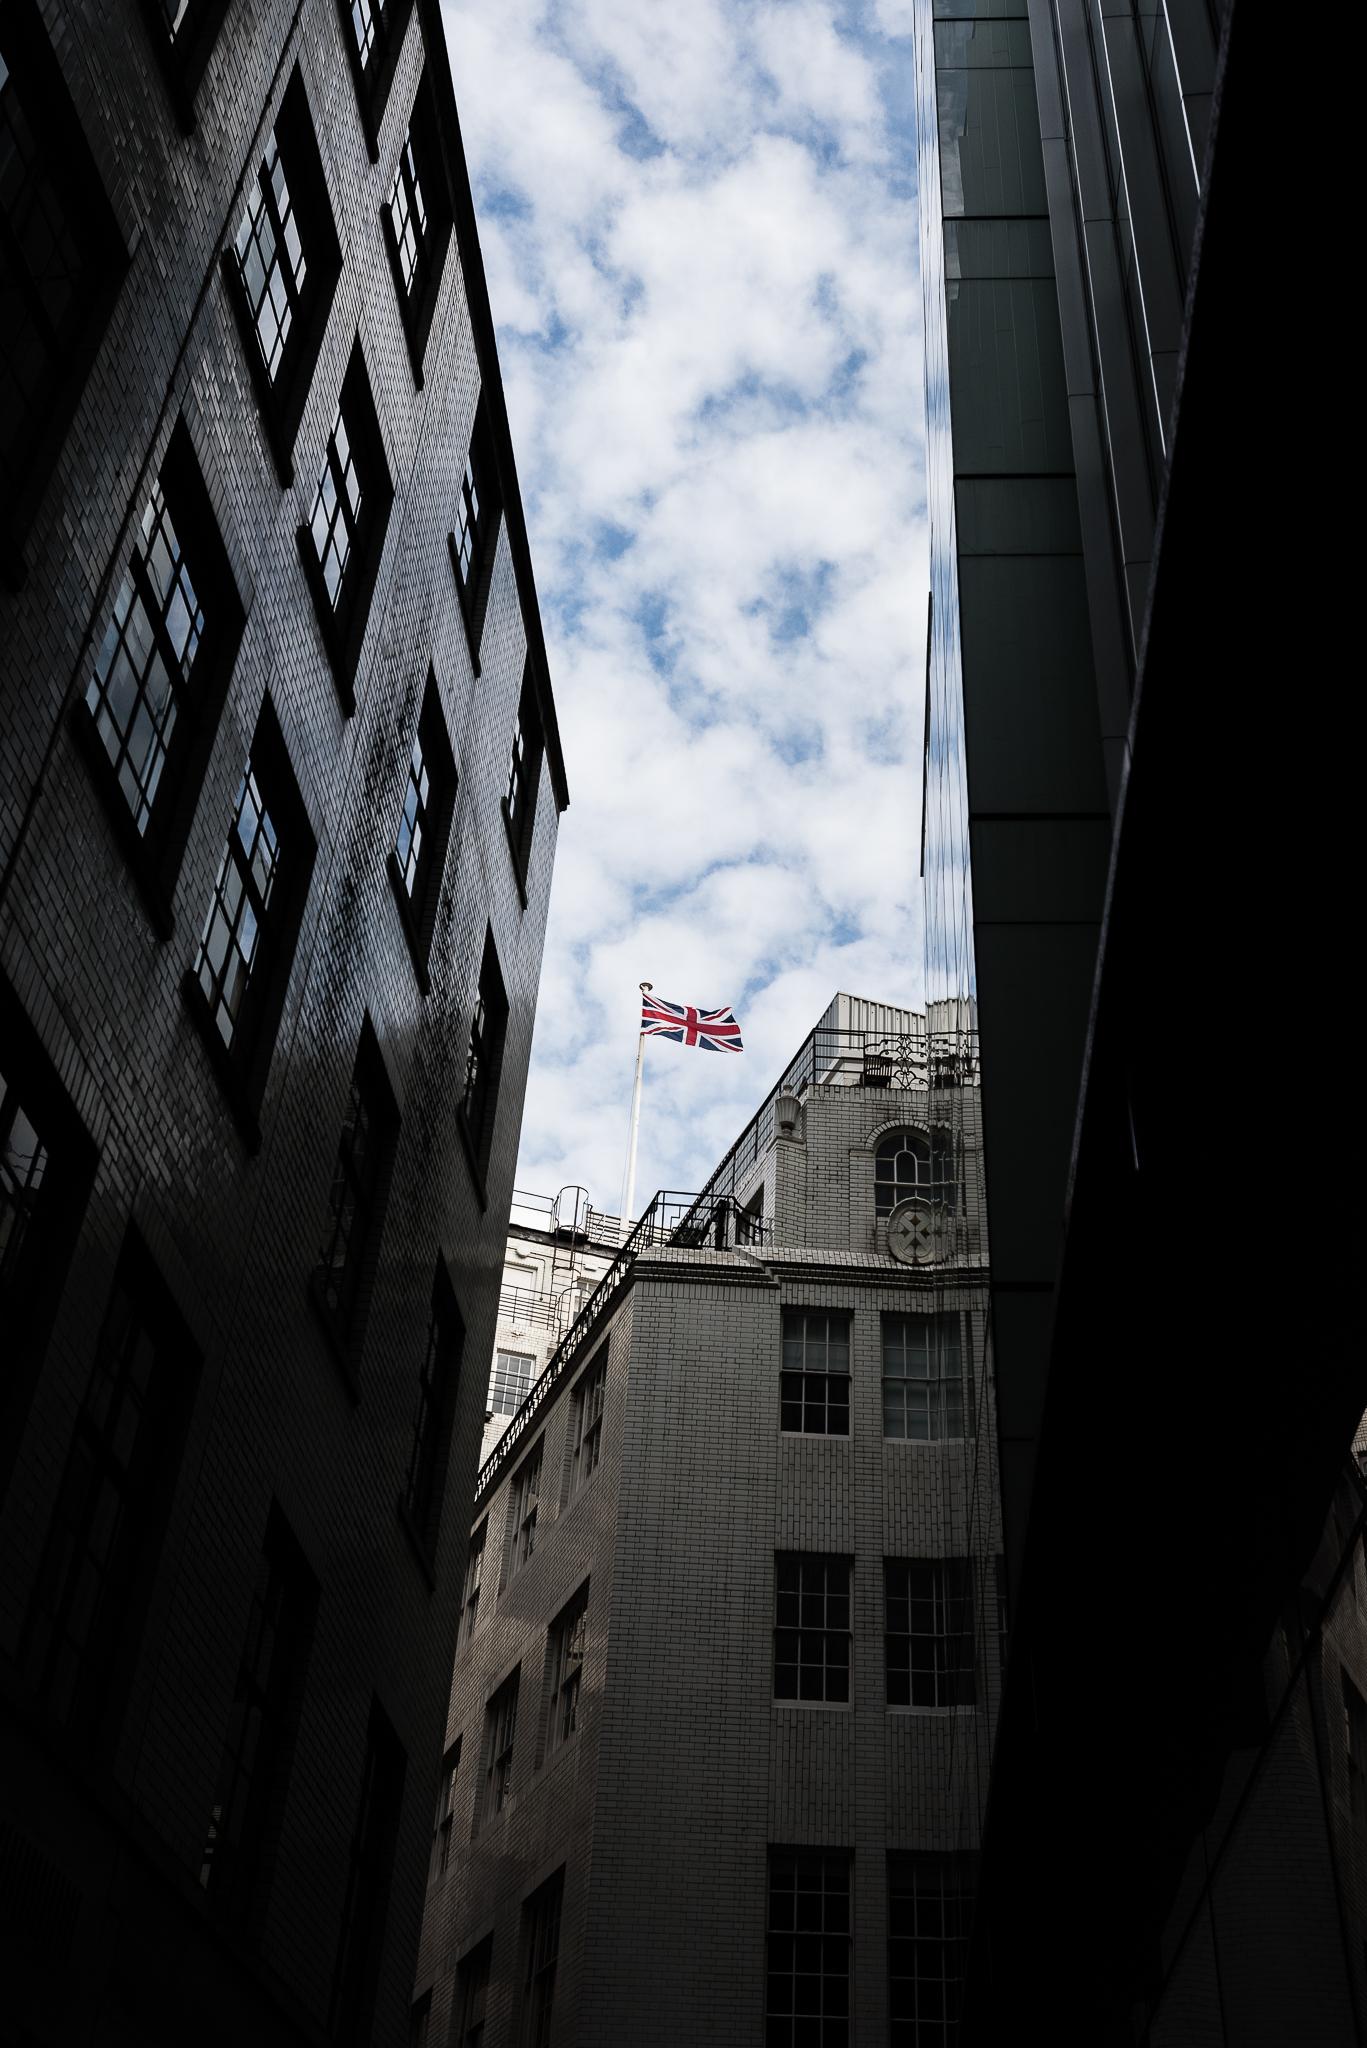 Union Jack, London